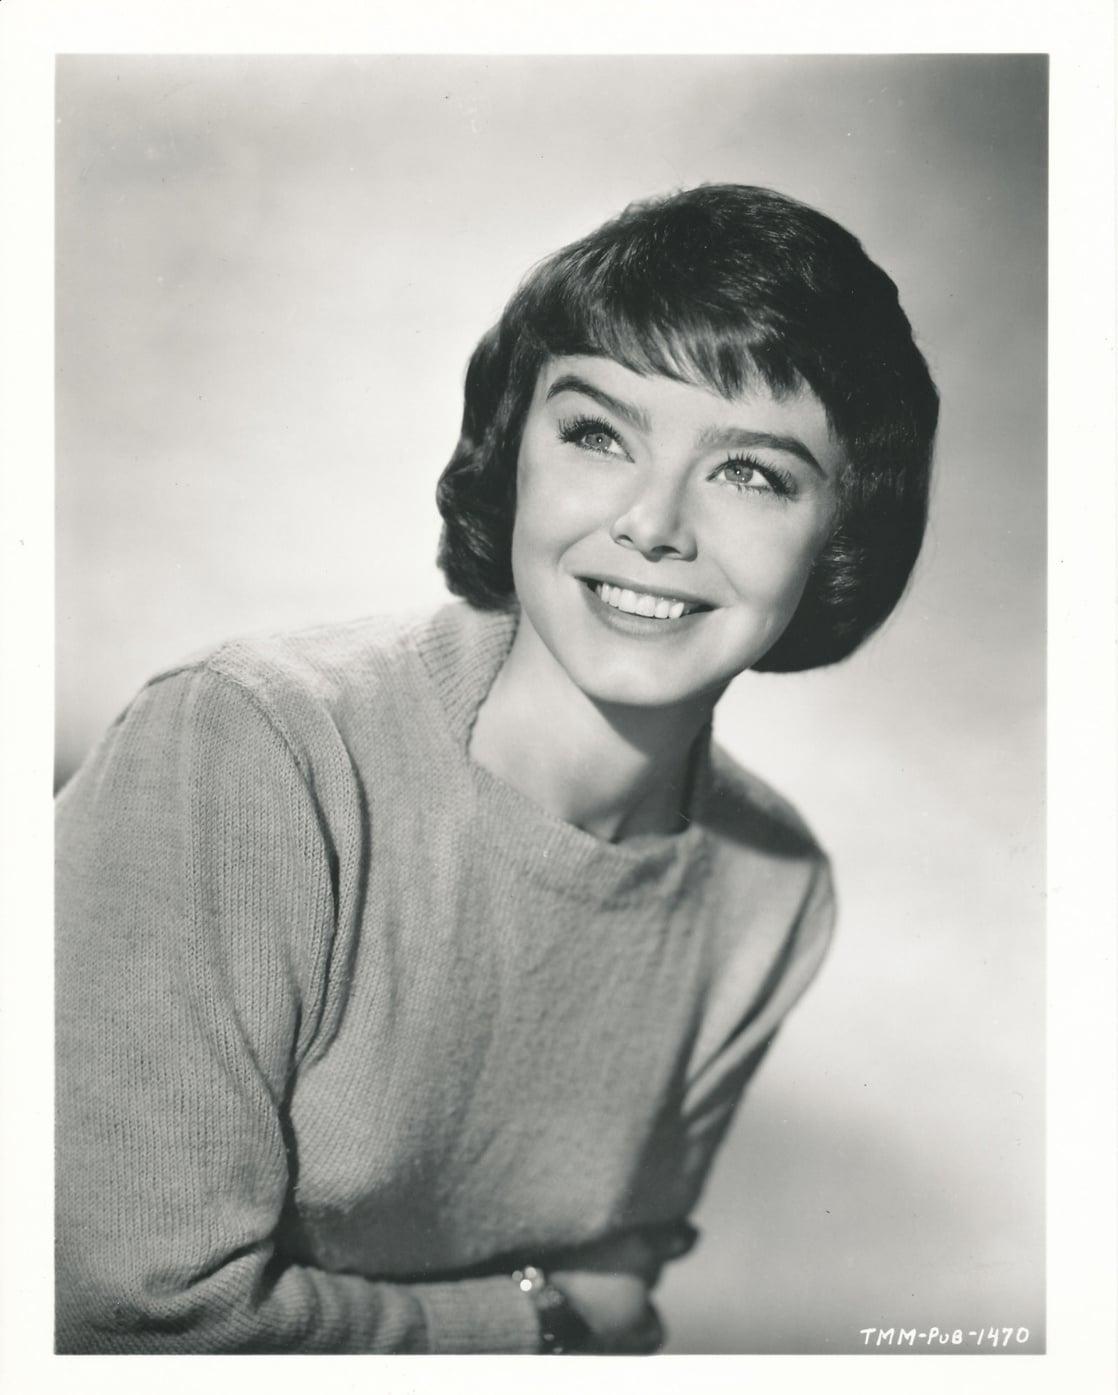 Janet Munro - All Celebrity Wiki